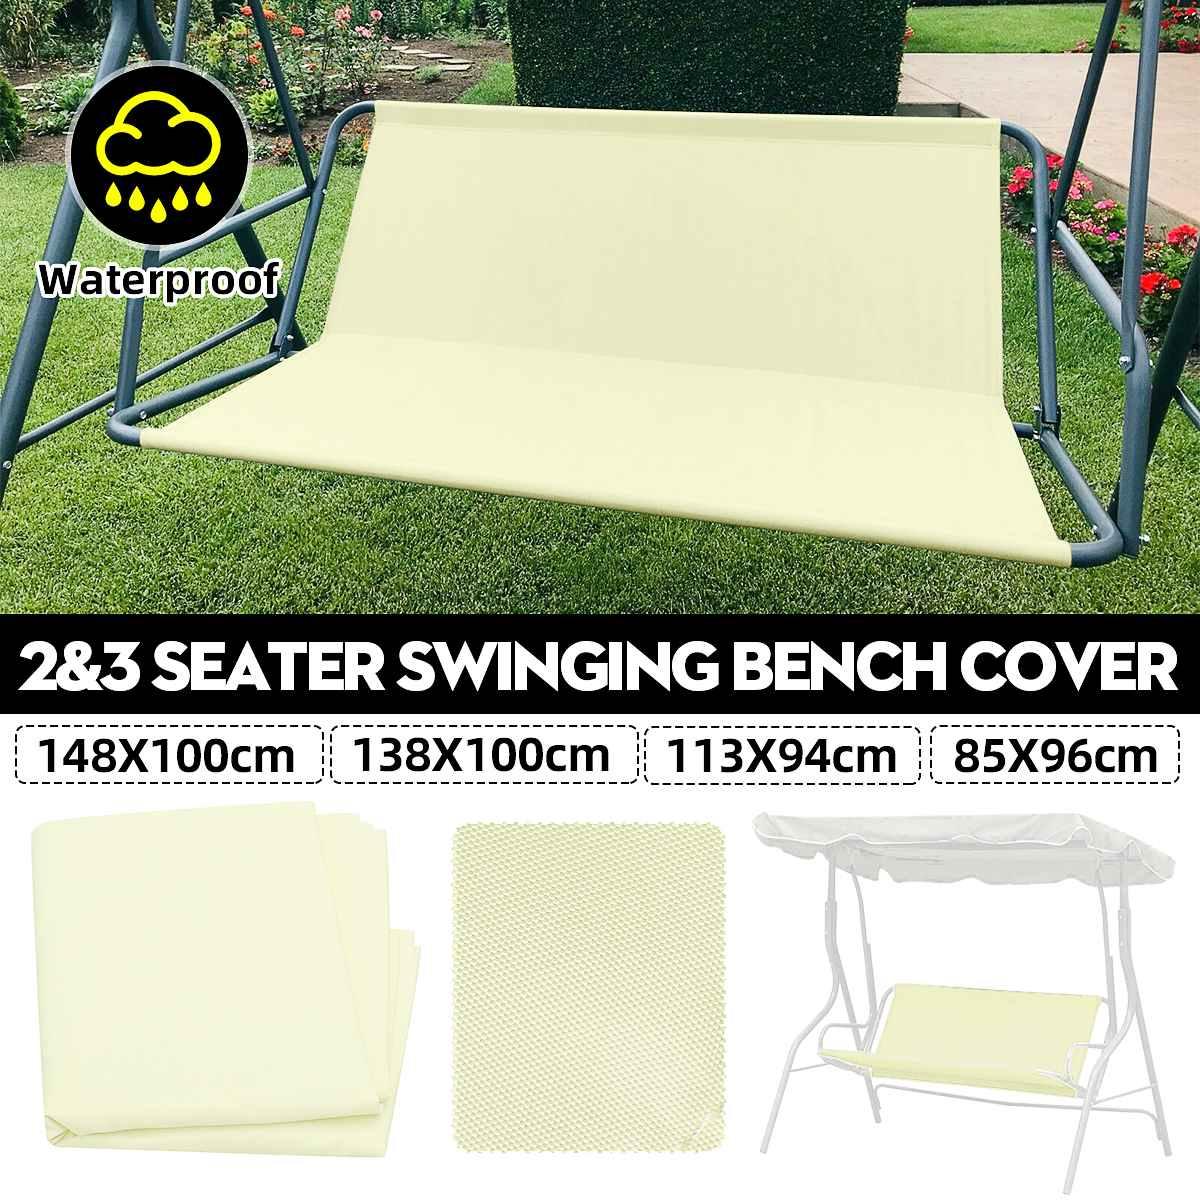 2/3 Seat Waterproof Swing Cover Chair Bench Replacement Patio Garden Outdoor Waterproof UV Resistant Swing Seat Furniture Cover